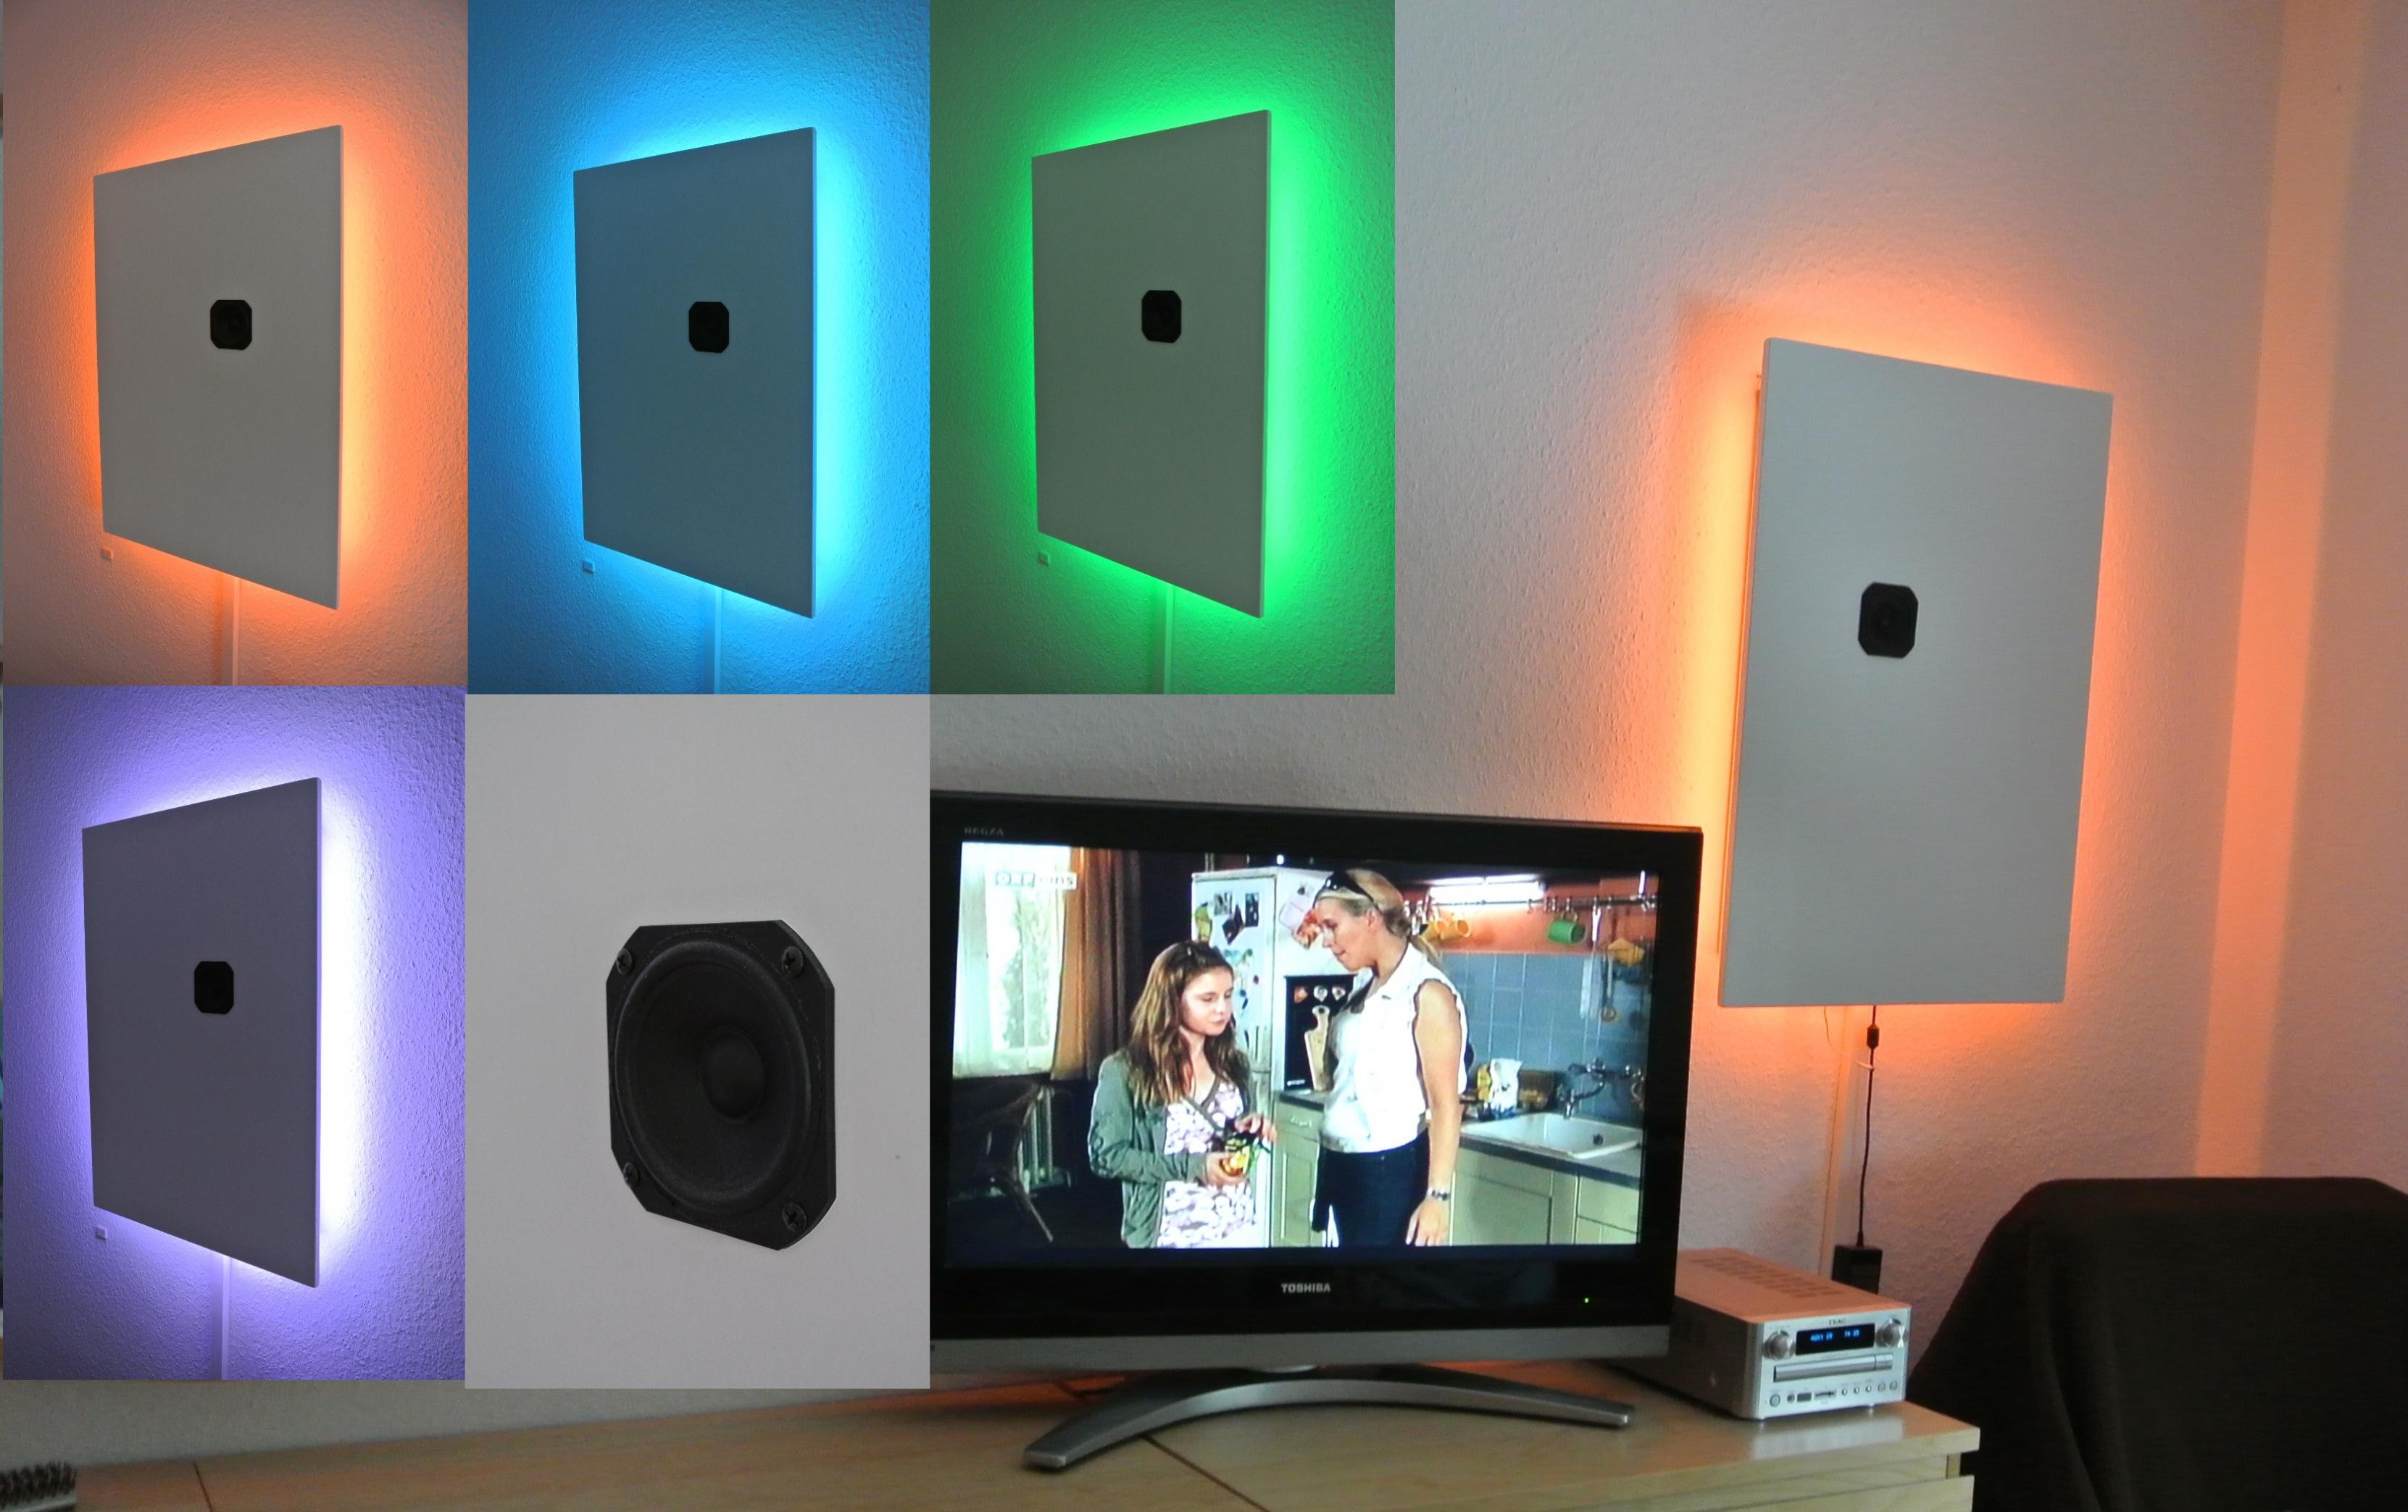 pc lautsprecher stereo computerbase forum. Black Bedroom Furniture Sets. Home Design Ideas